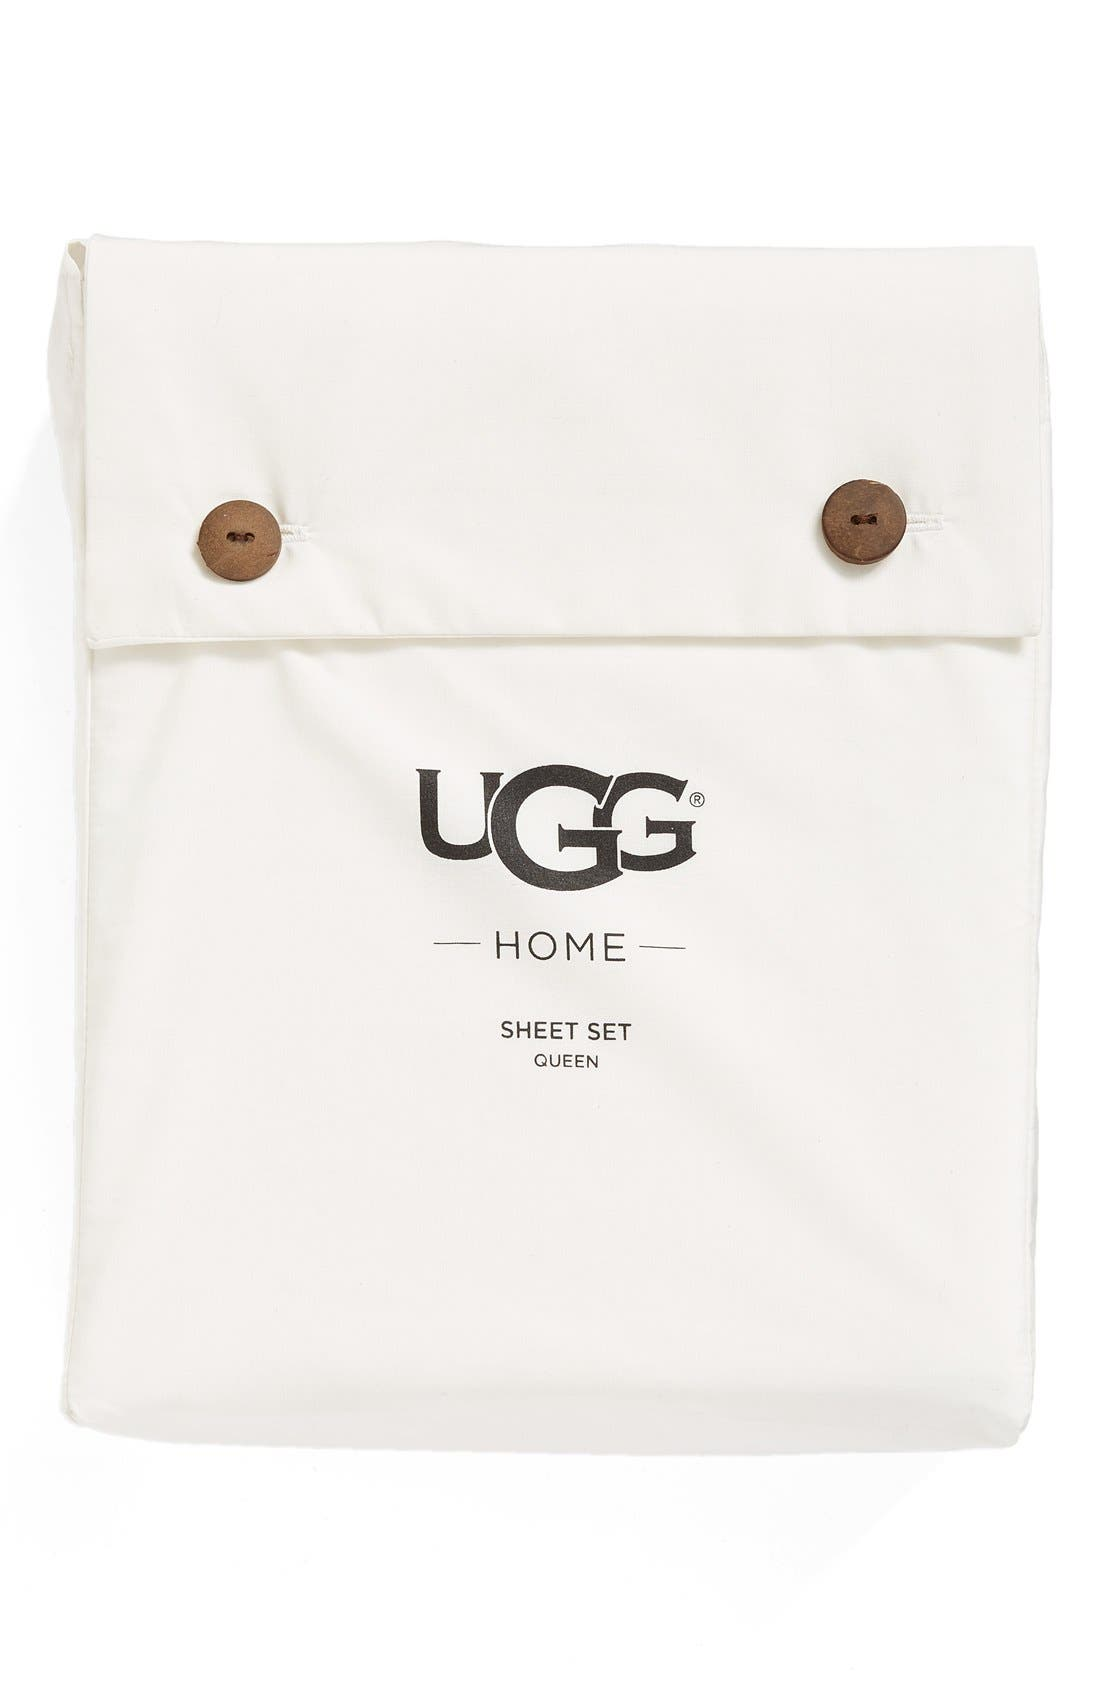 ugg home sheet set